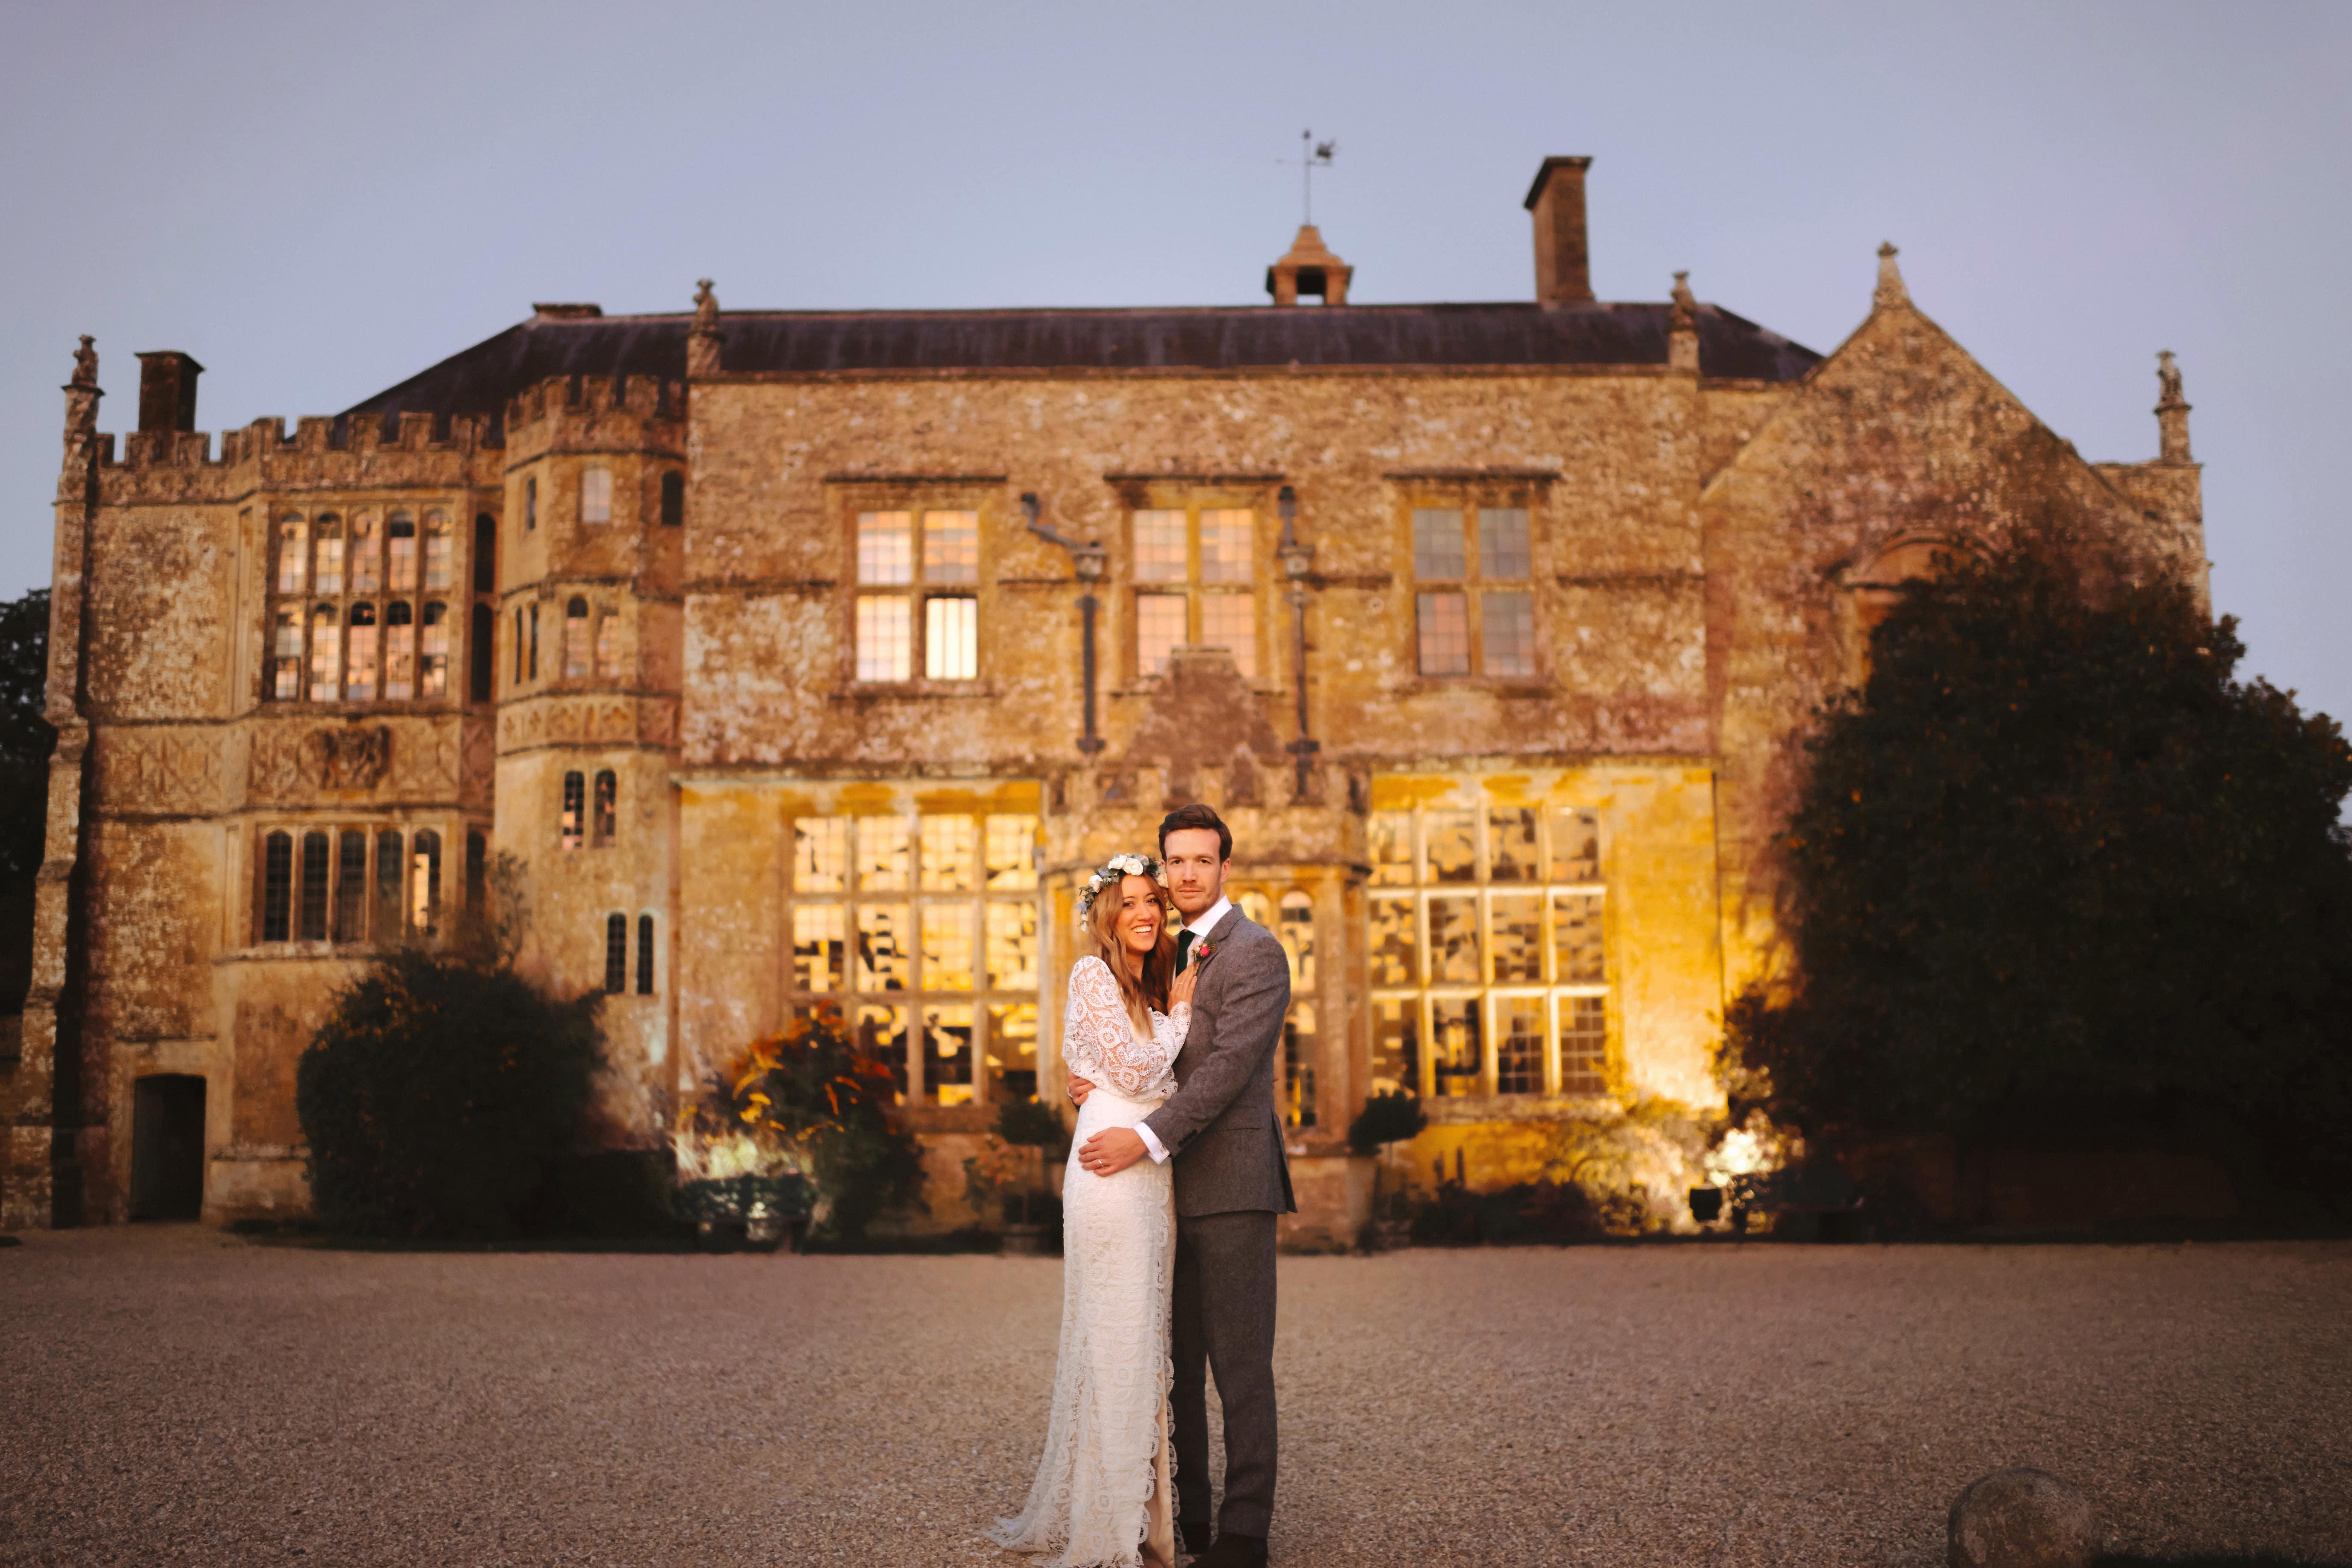 Brympton House Wedding ceremony